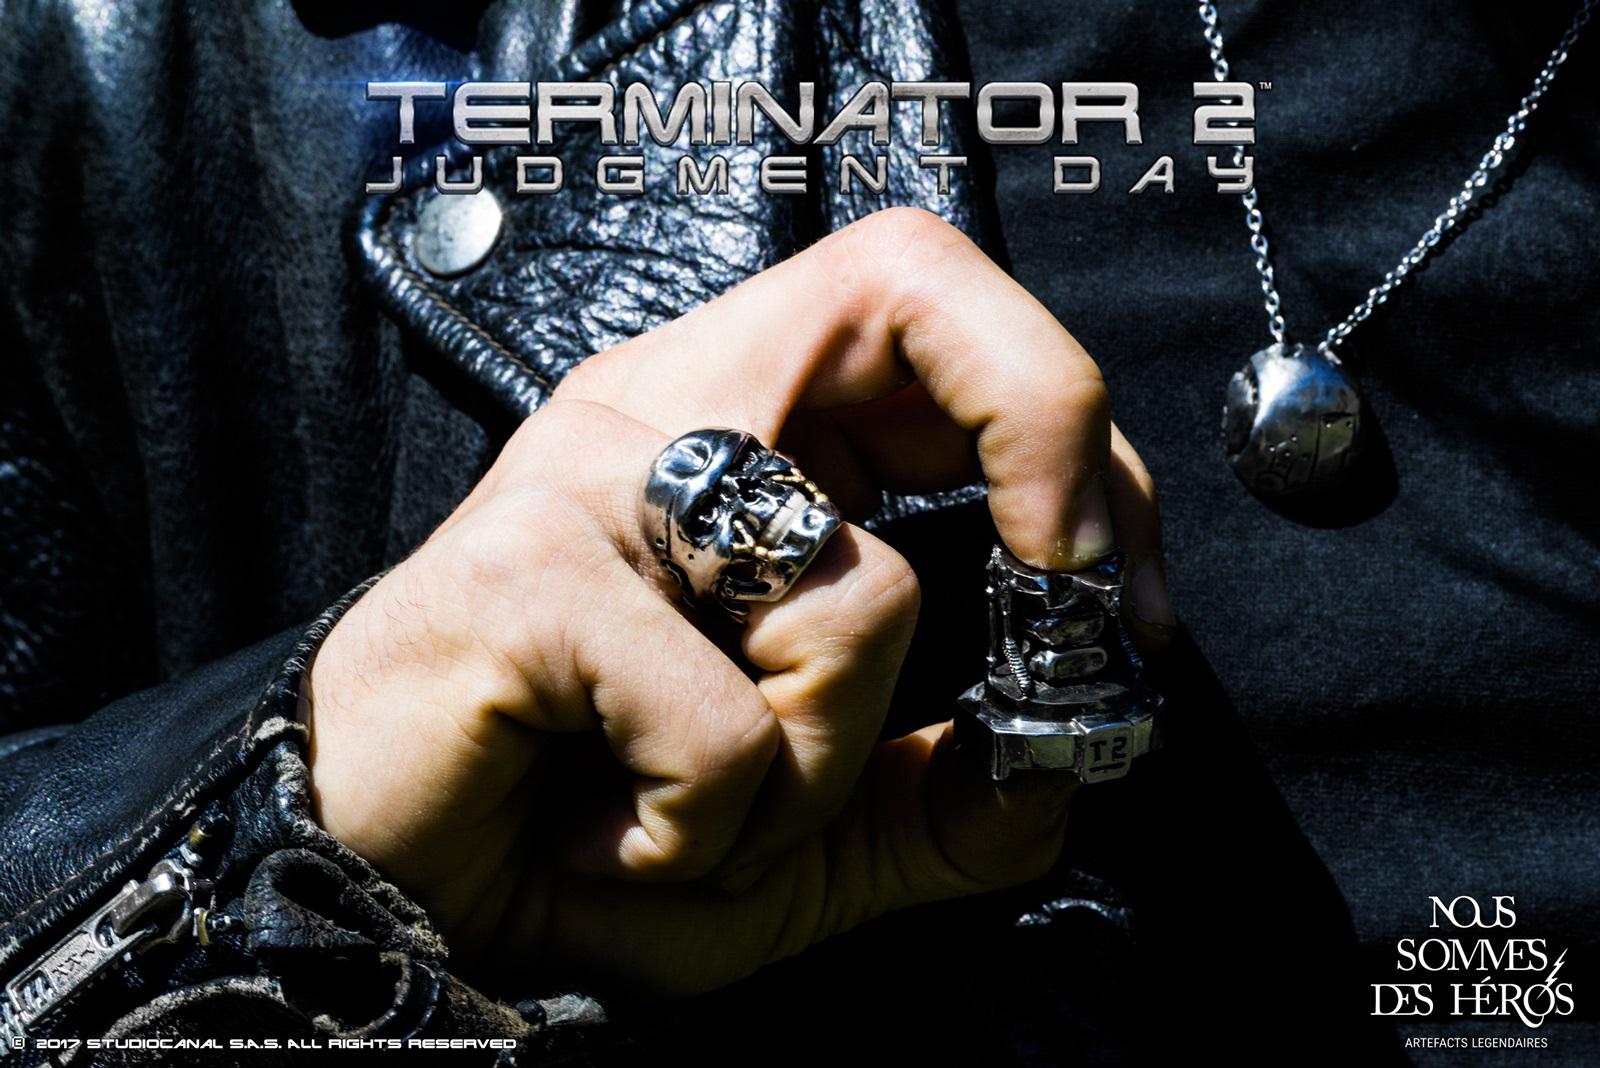 NSDH-Terminator_2_photo.jpg